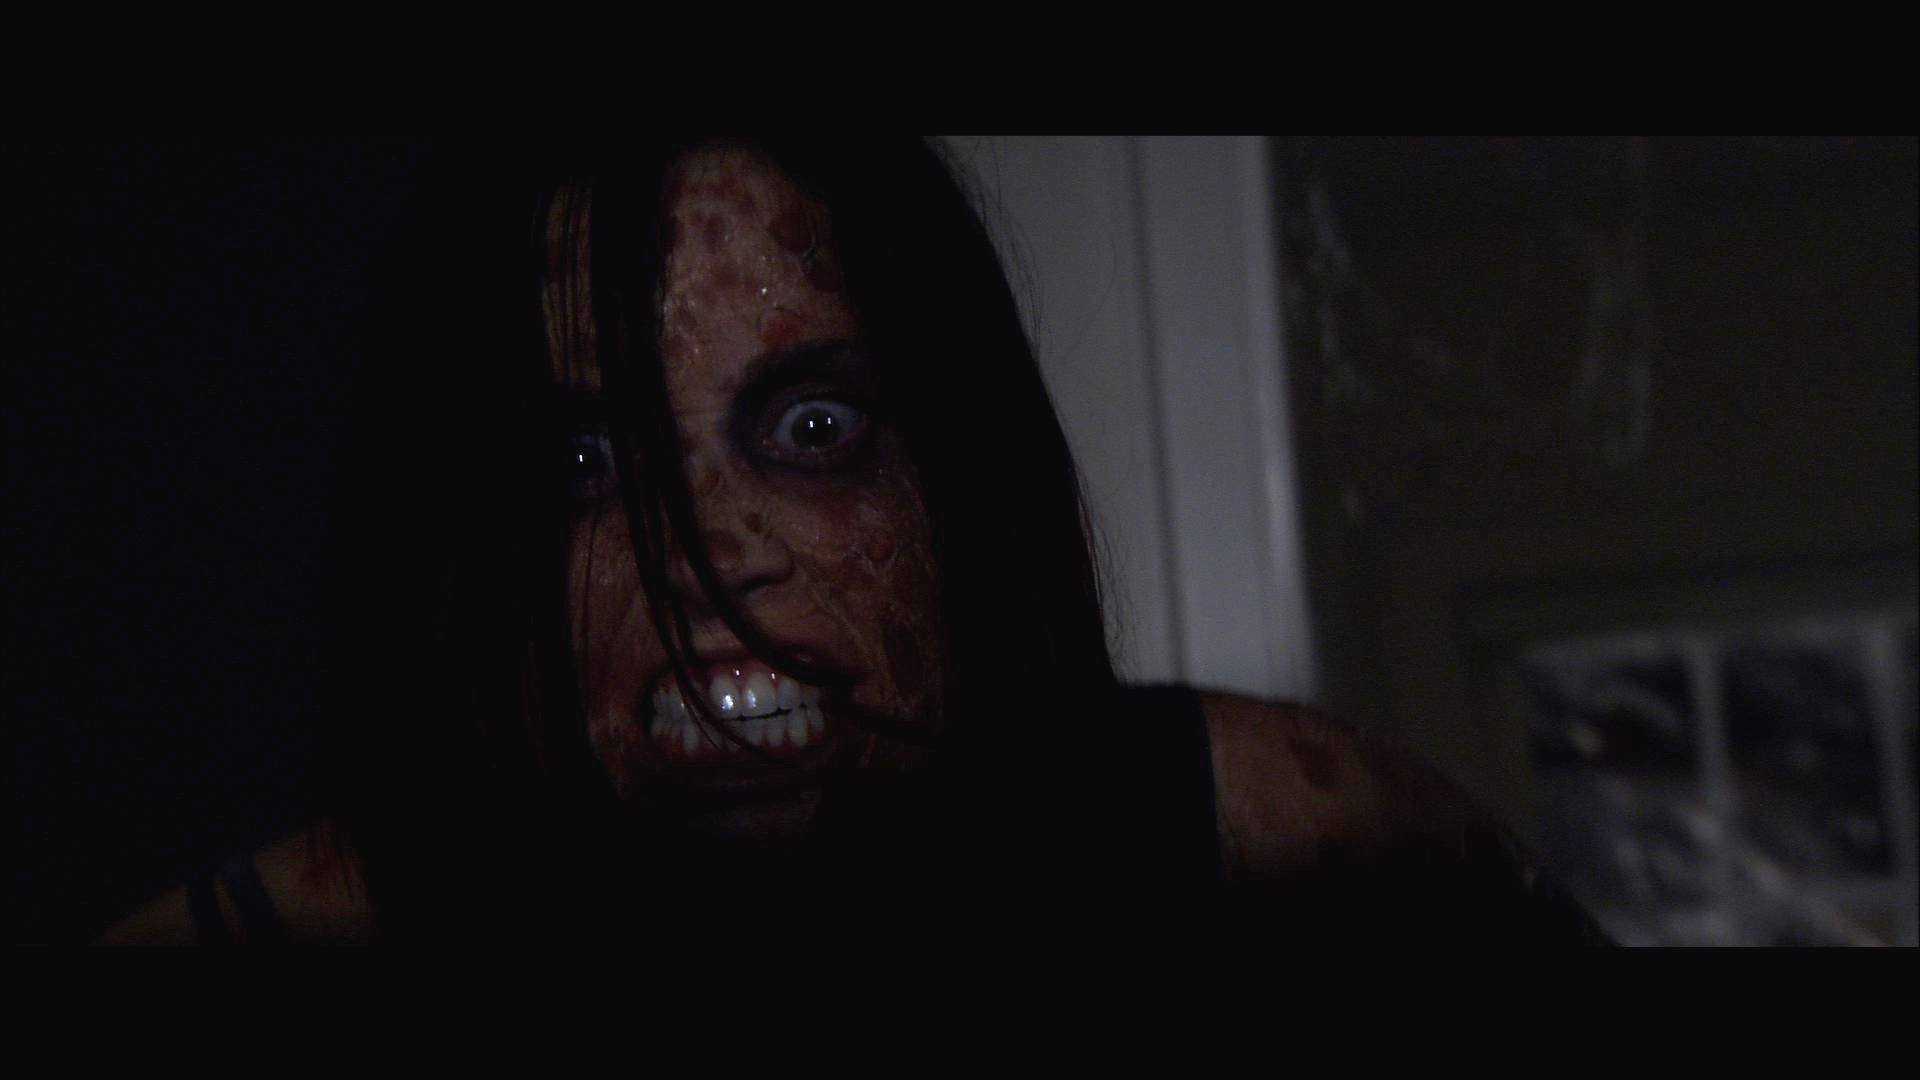 Hooker zombie(Wendi Hughes).